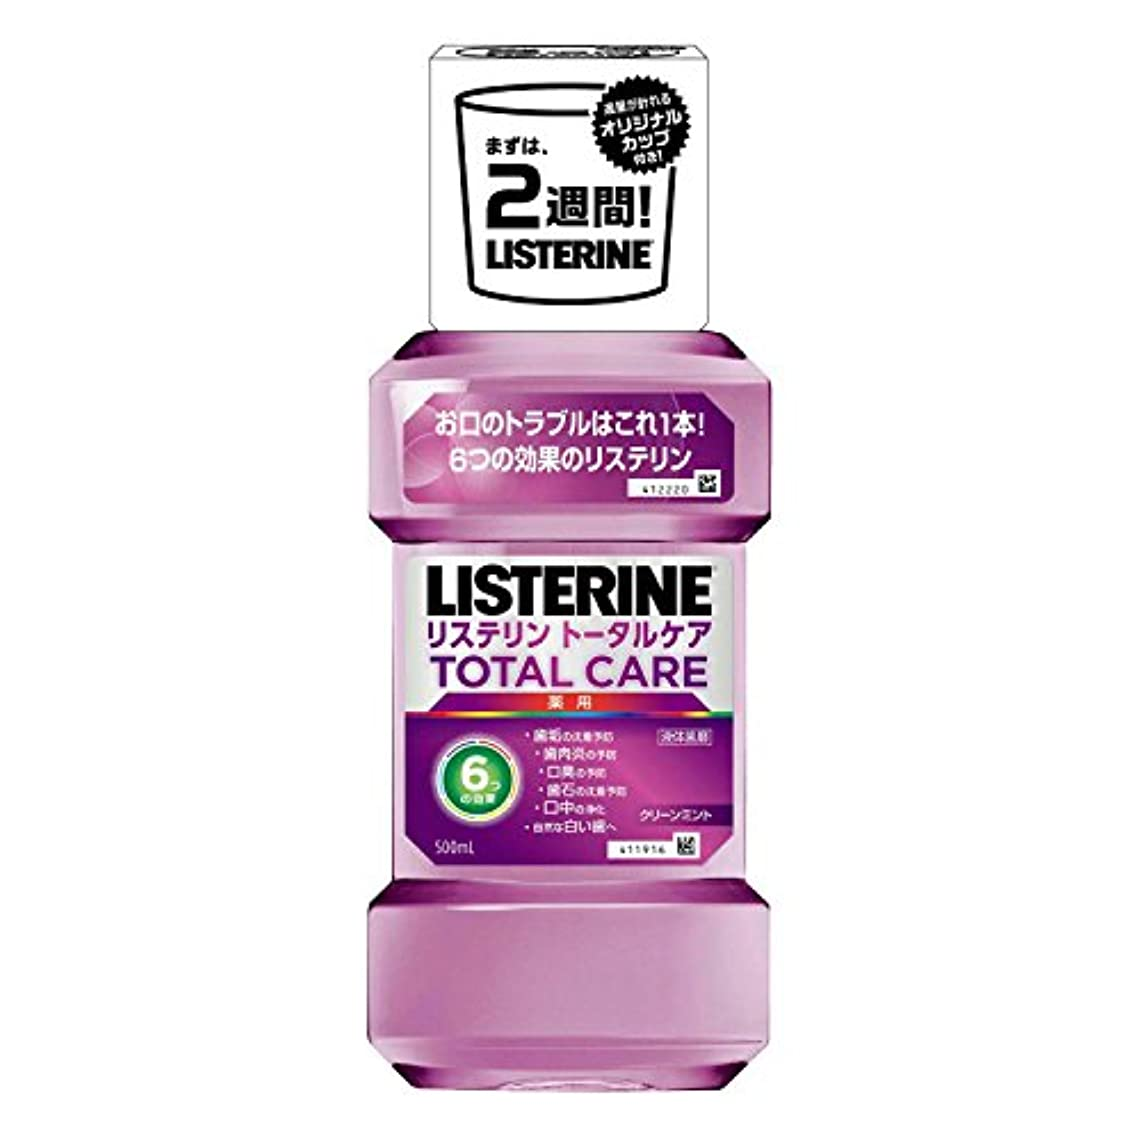 【Amazon.co.jp限定】薬用 LISTERINE リステリン トータルケア カップ付き 500mL [医薬部外品]